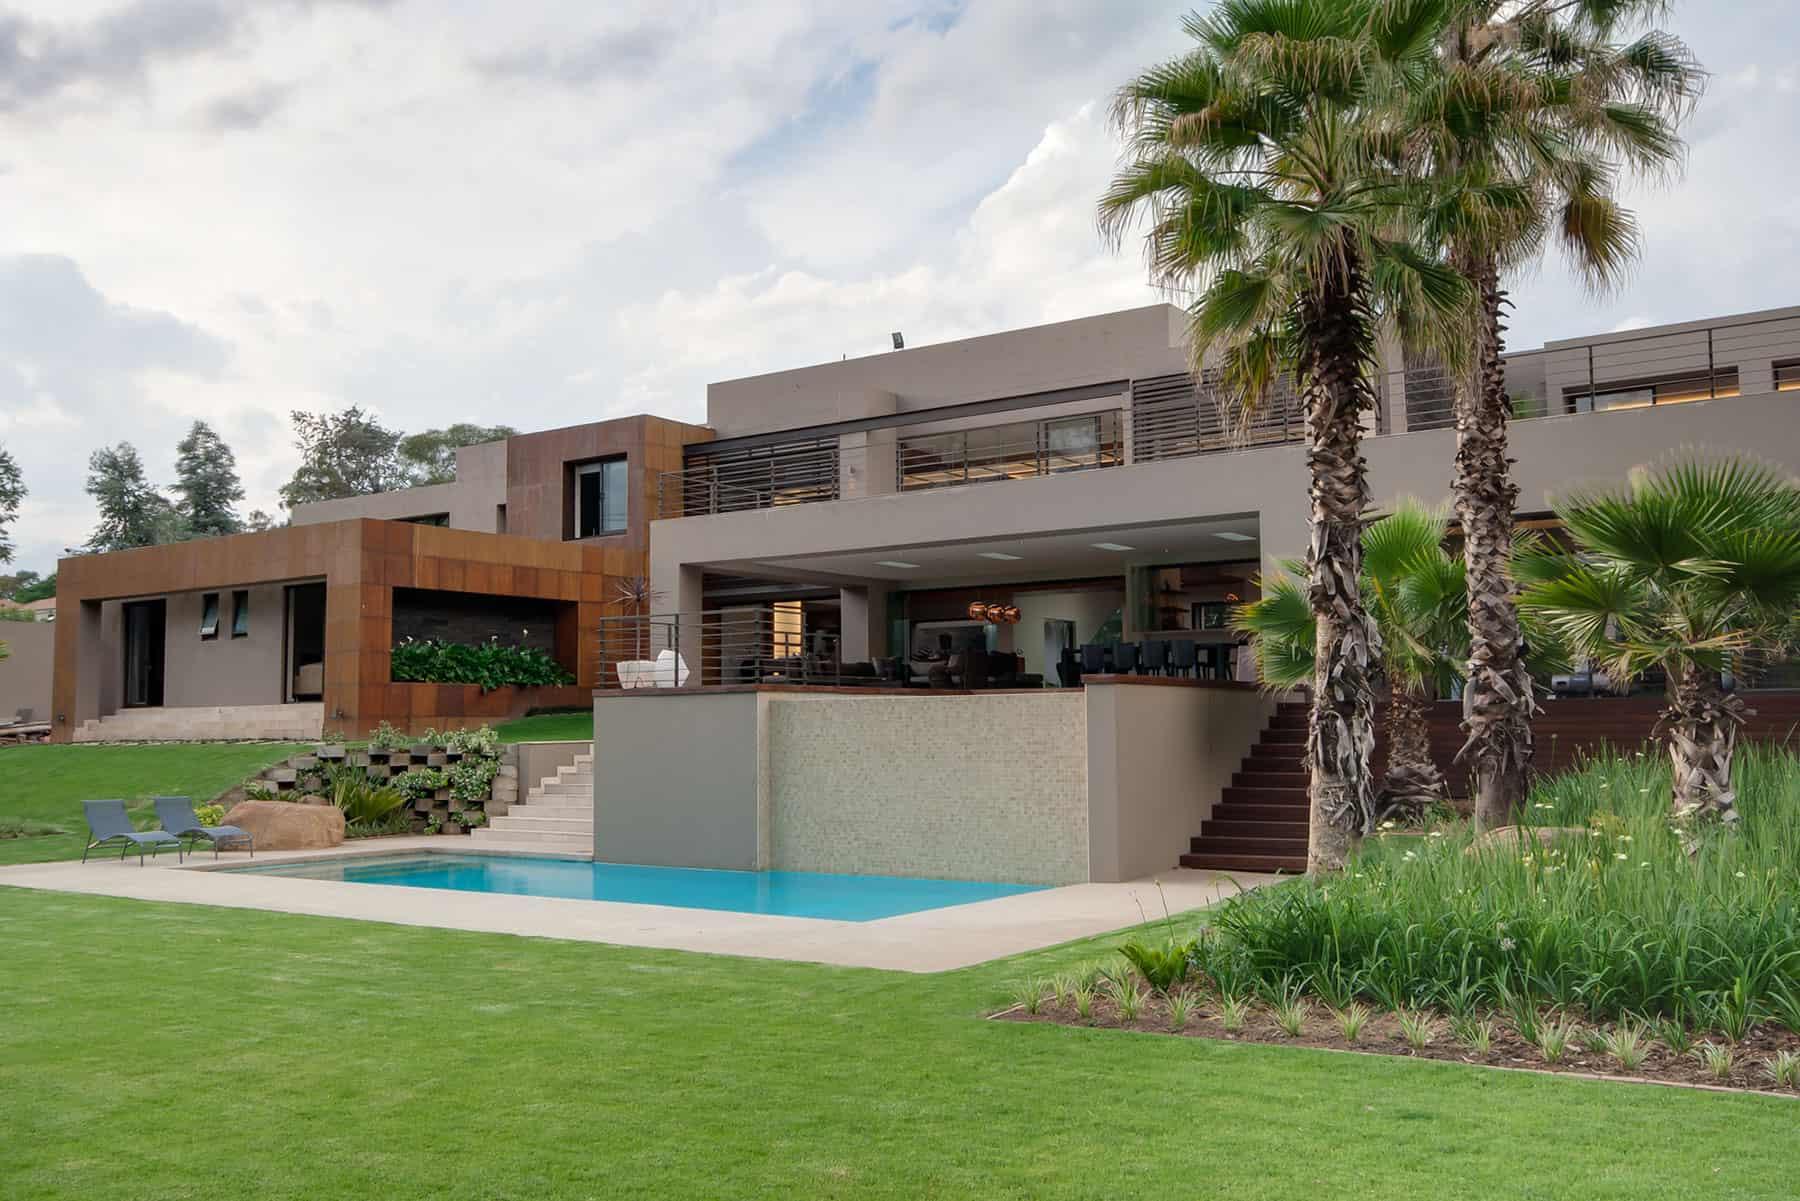 House Sed by Nico van der Meulen Architects (4)